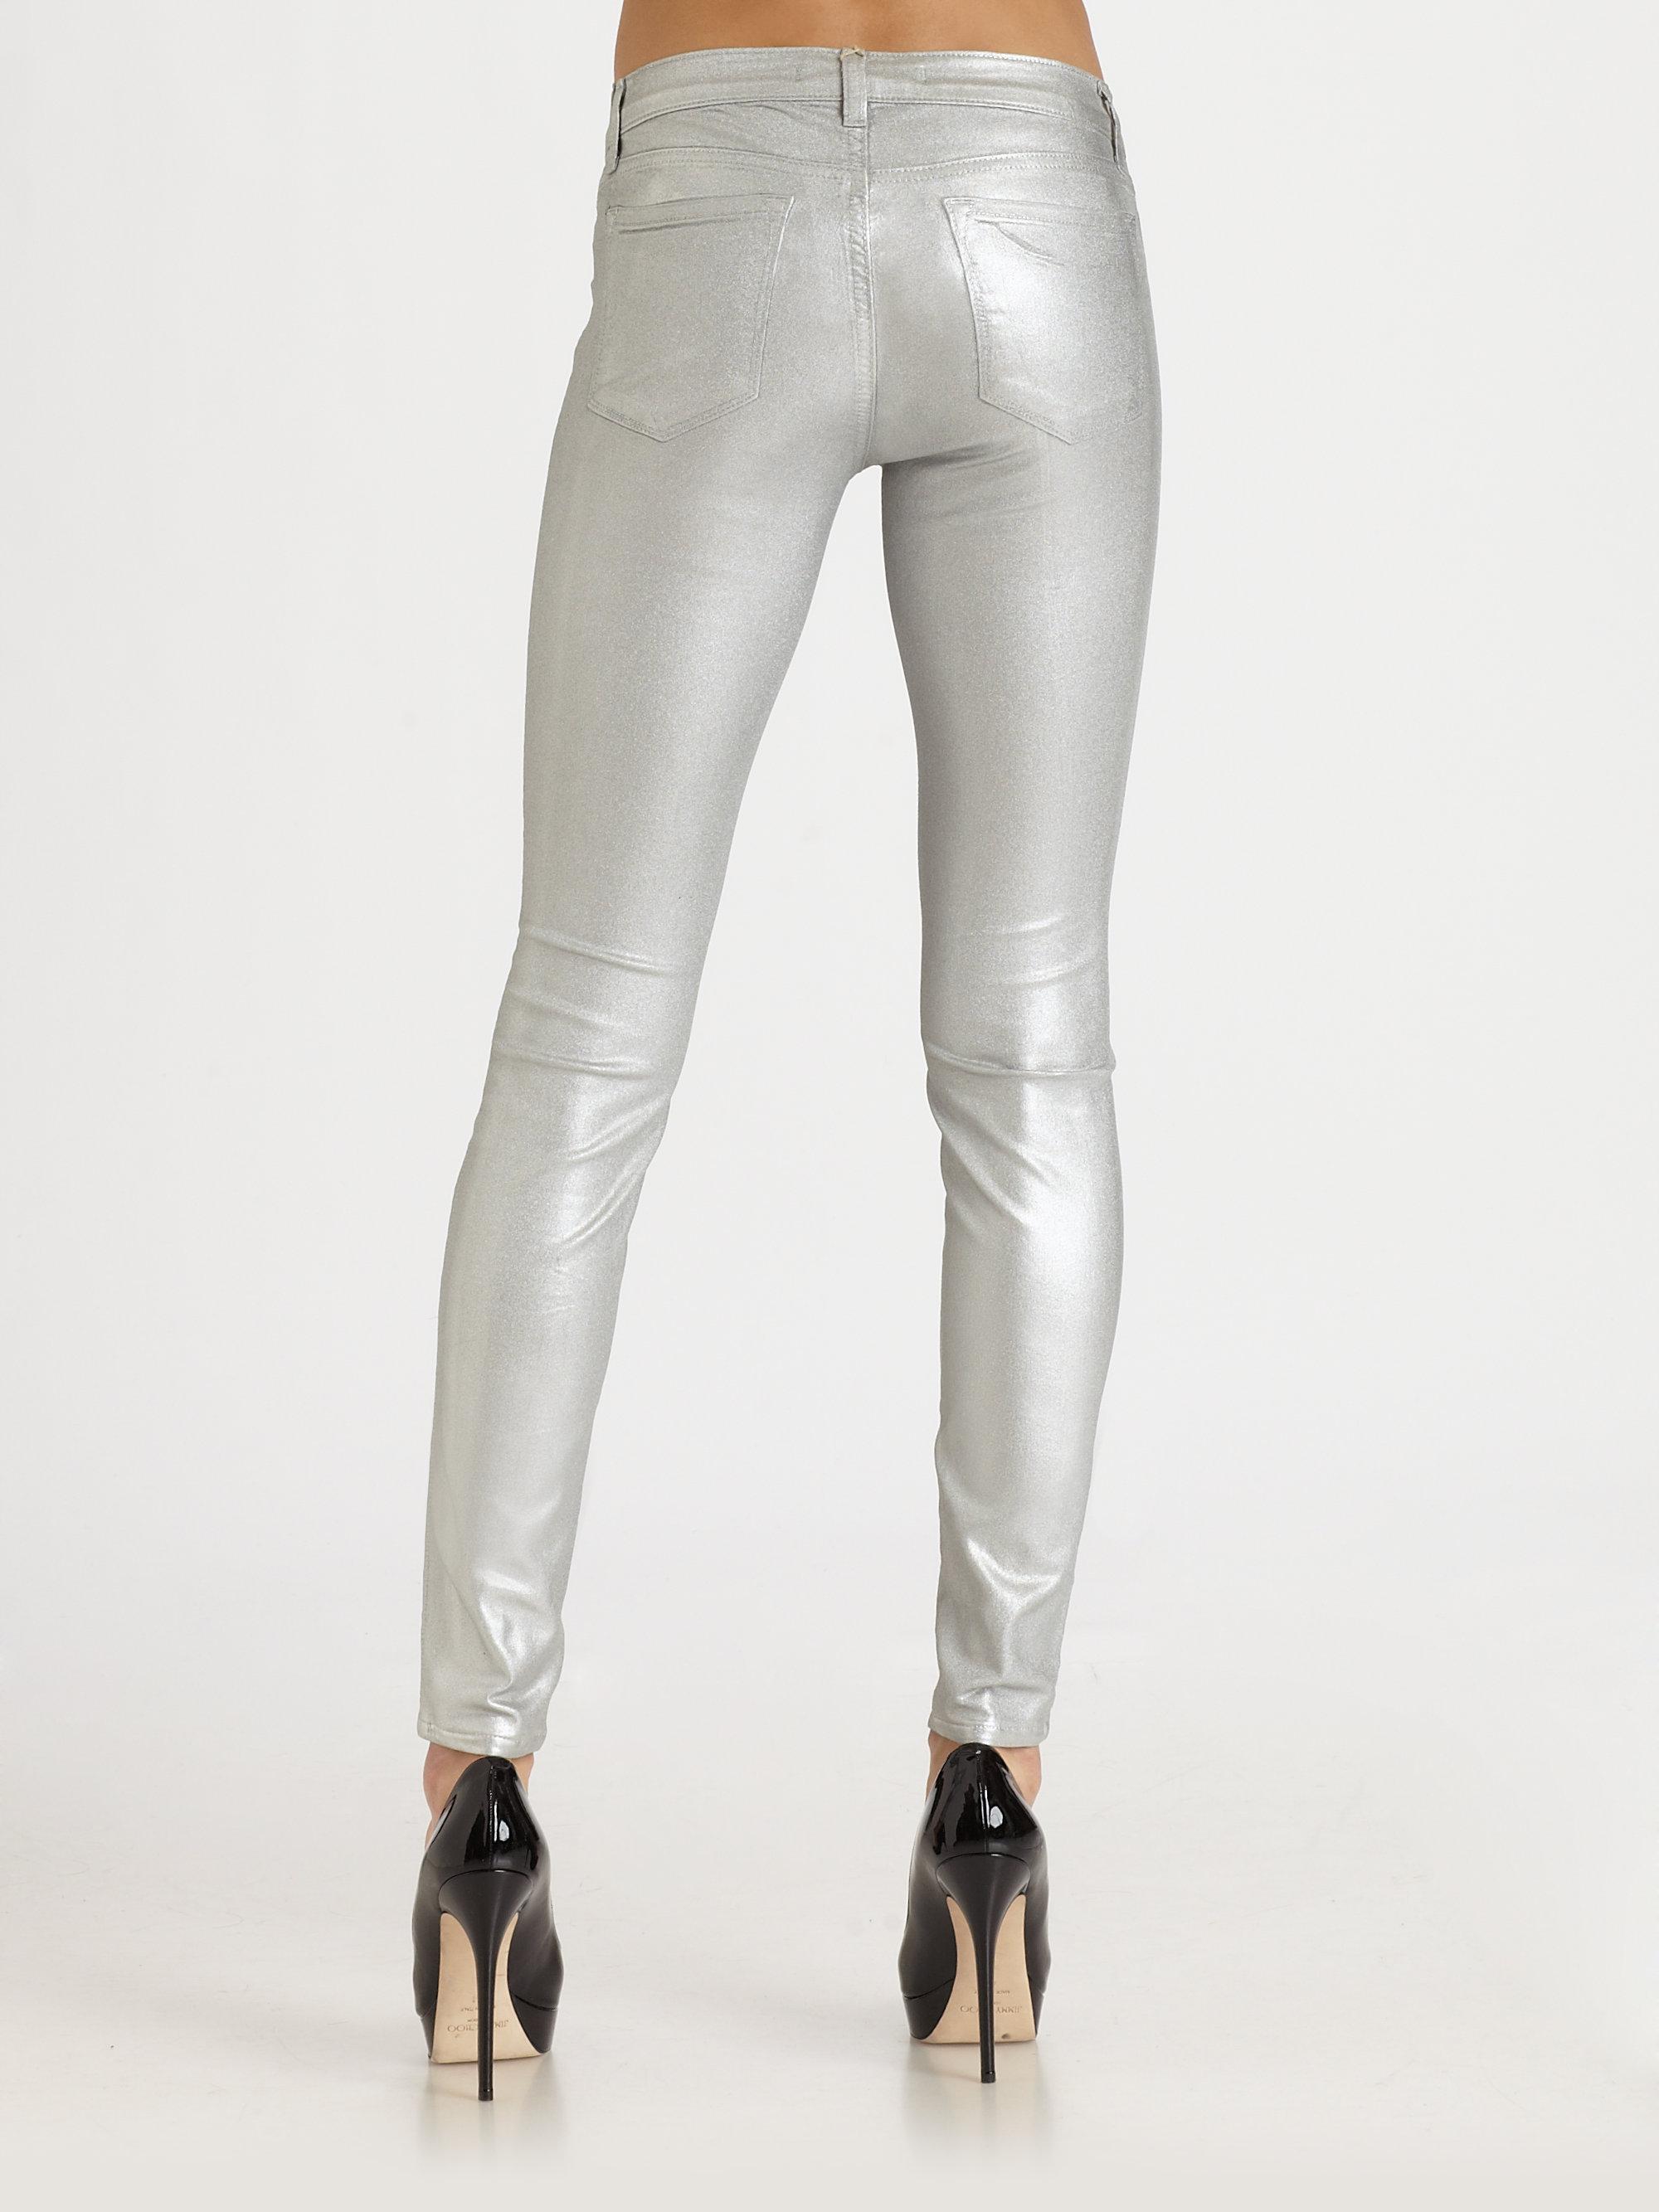 Stretch Skinny Jeans For Women